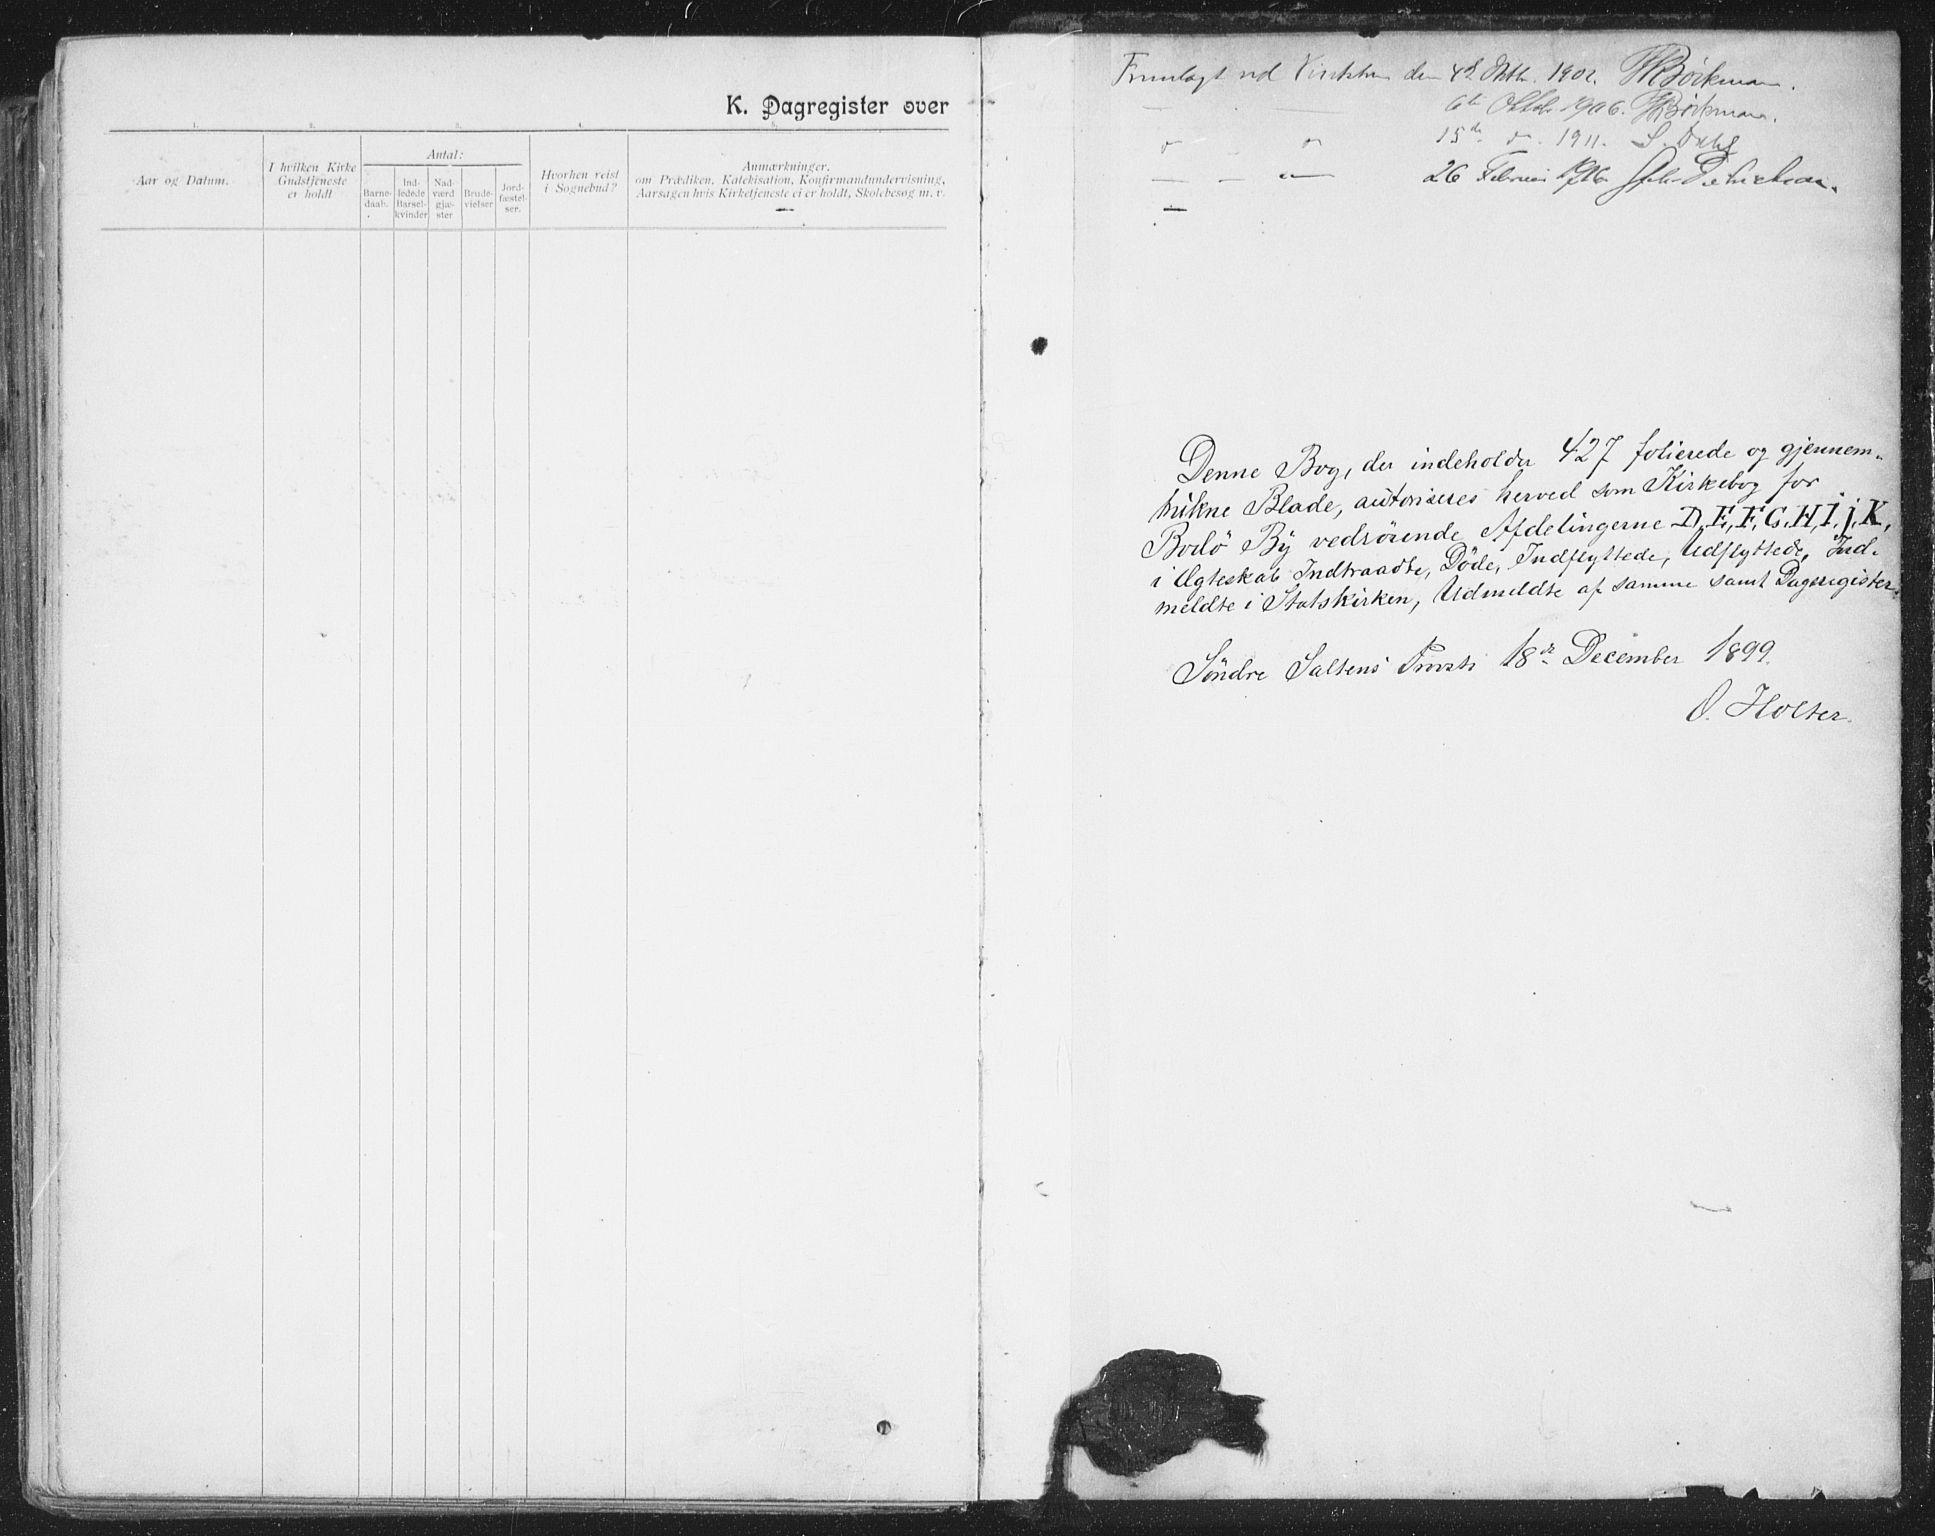 SAT, Ministerialprotokoller, klokkerbøker og fødselsregistre - Nordland, 801/L0012: Ministerialbok nr. 801A12, 1900-1916, s. 397